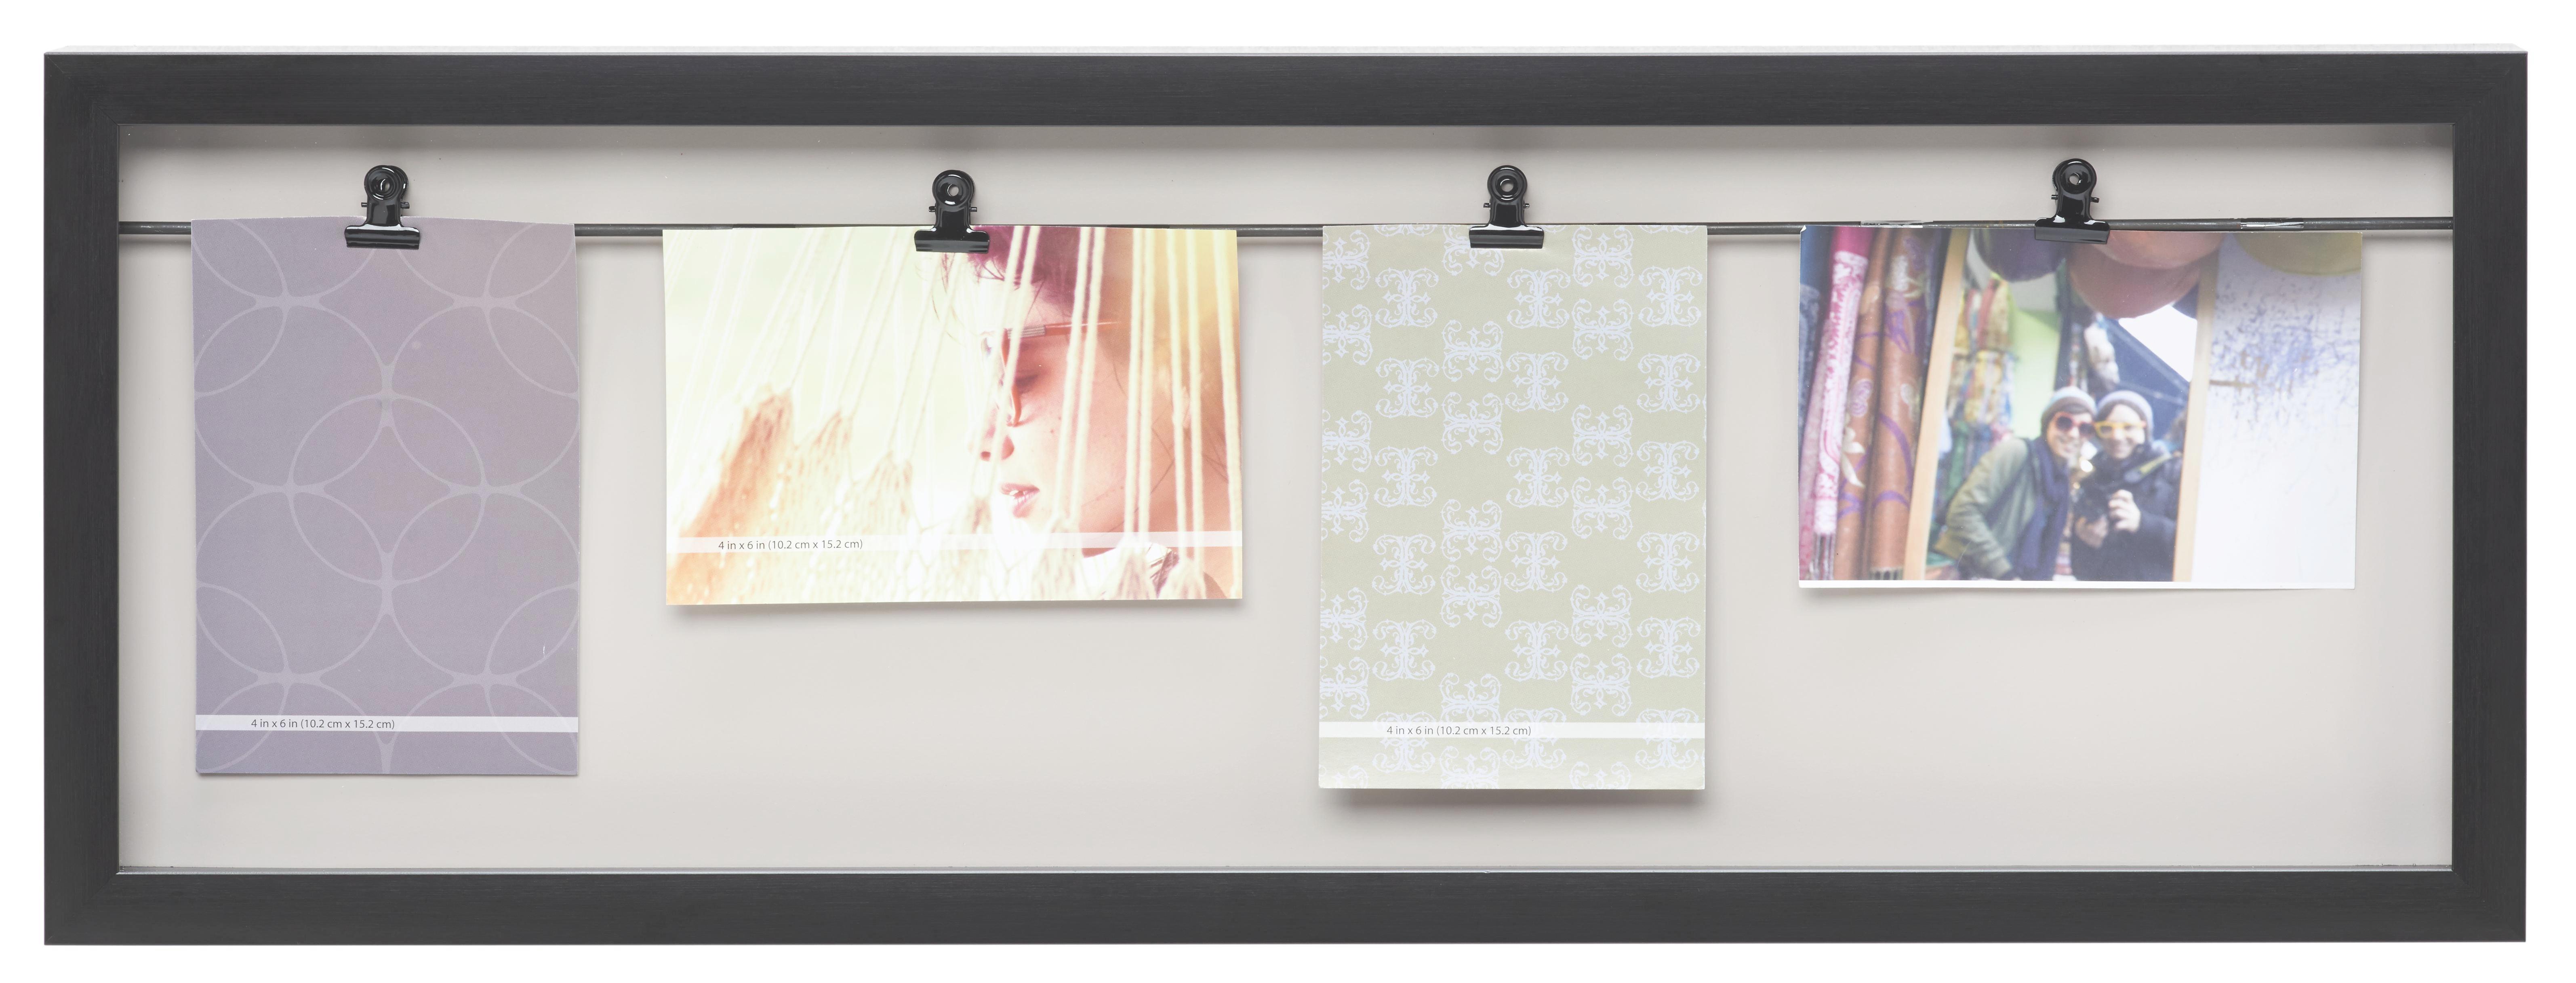 Fotohalter Casius, ca. 65,3x24x3,5cm - Schwarz, MODERN, Kunststoff (65,3/24/3,5cm) - MÖMAX modern living